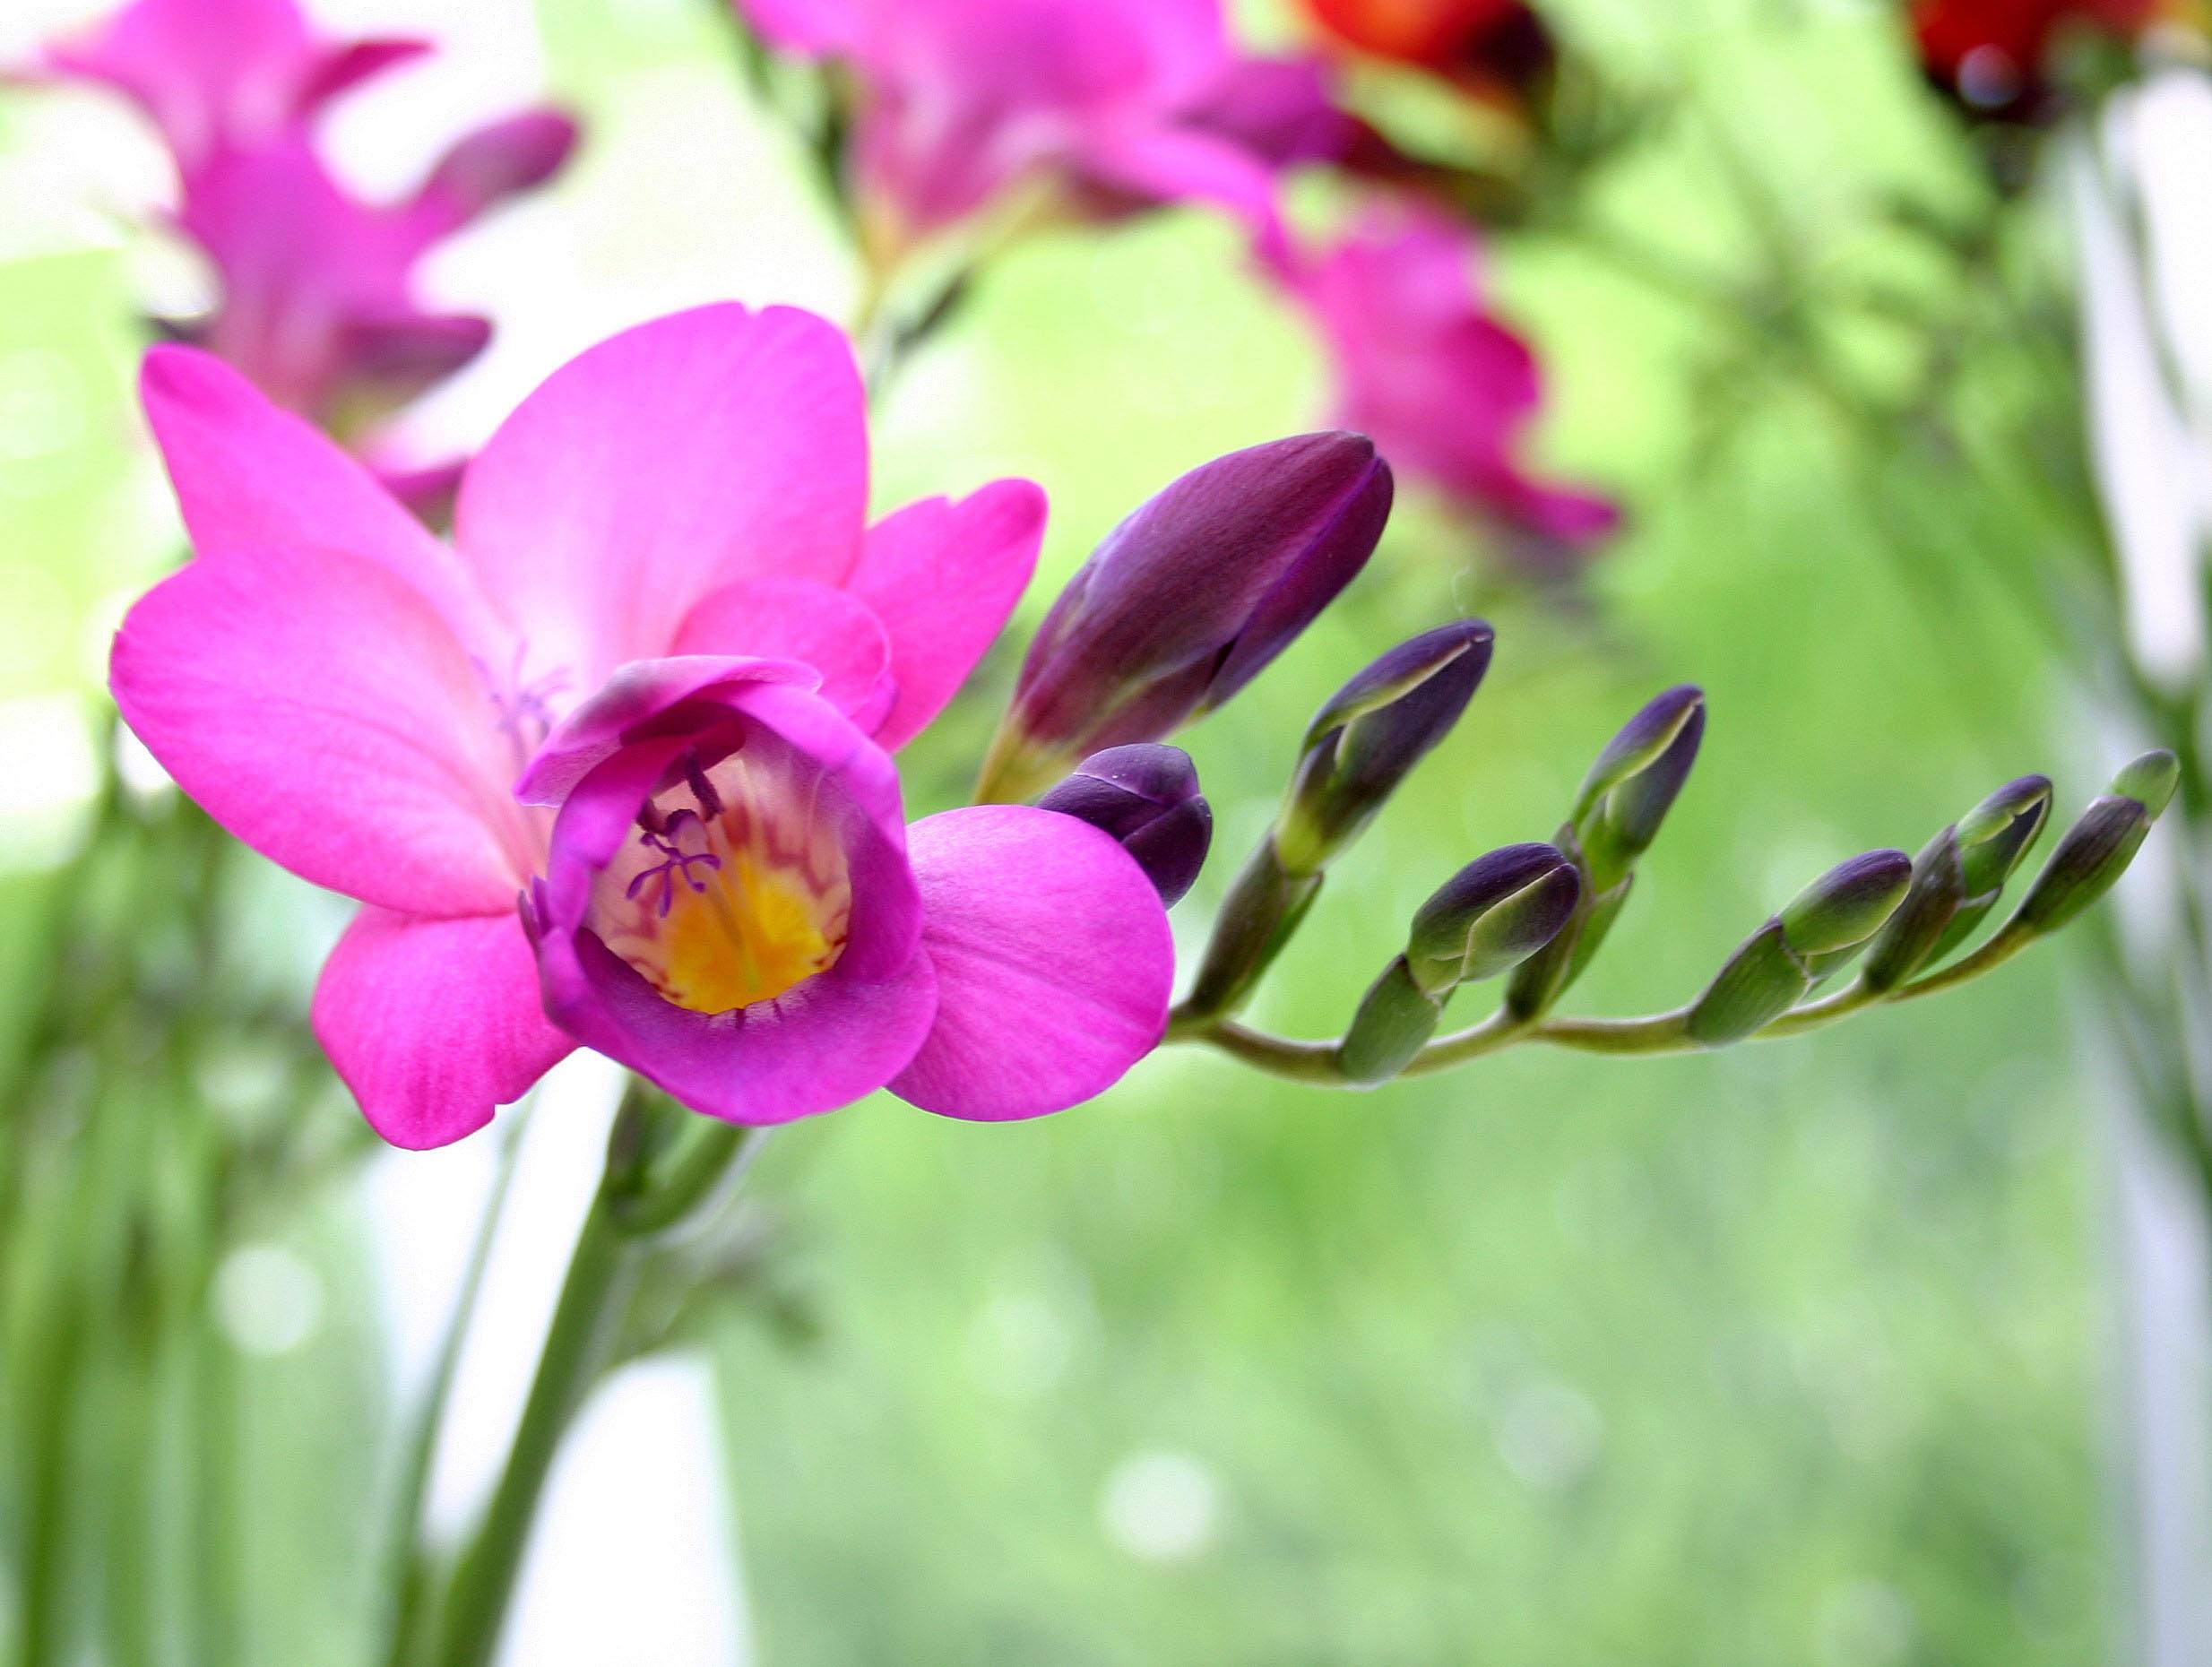 Ярко-розовый цветок фрезии